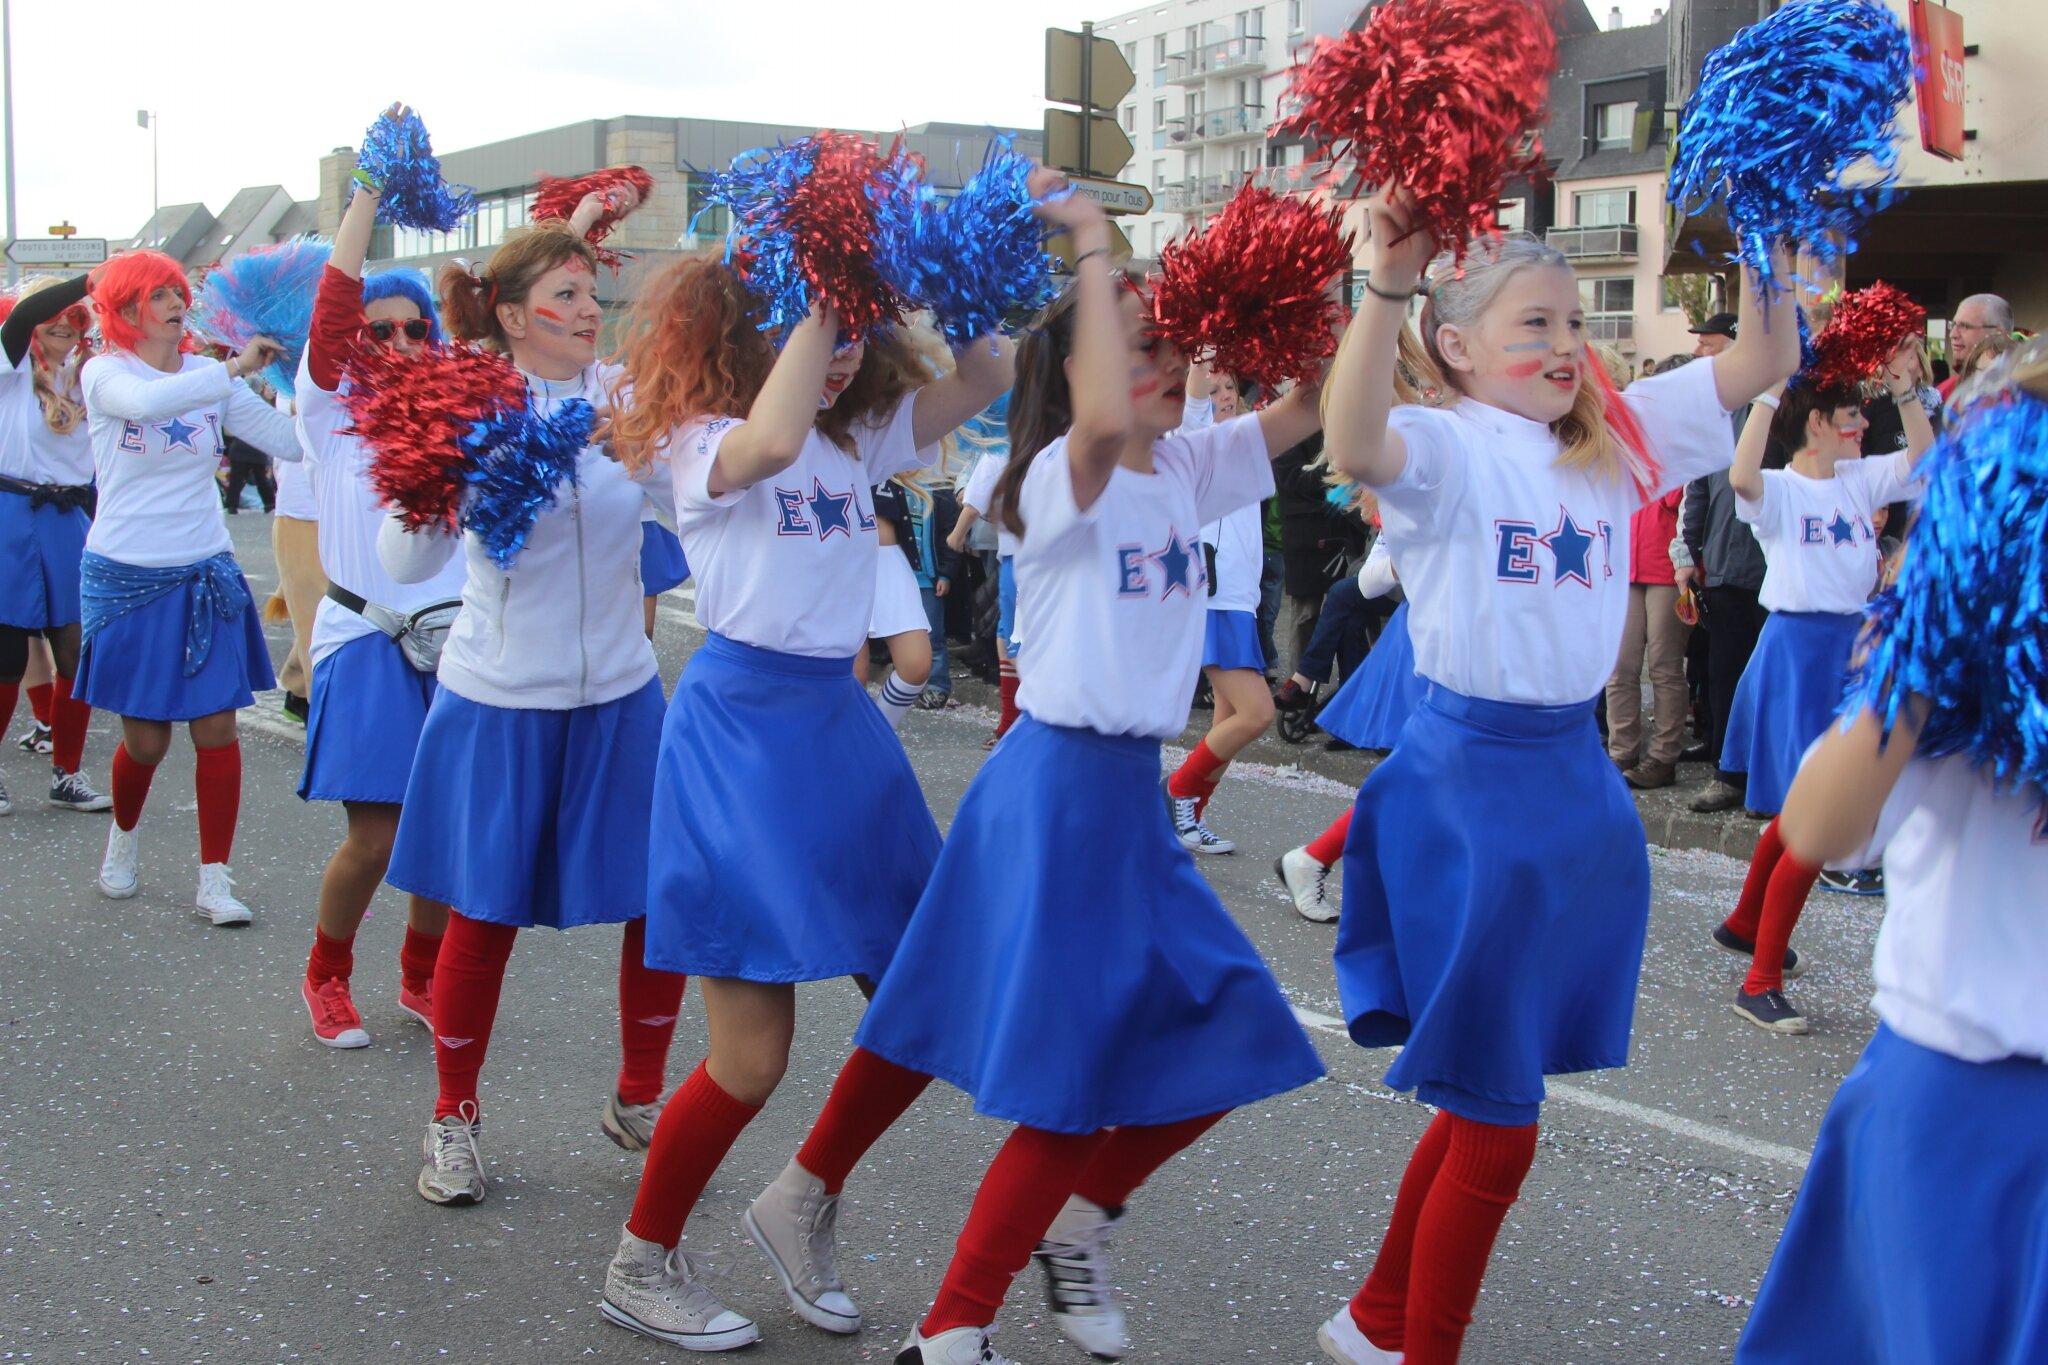 carnaval de landerneau 2014 161